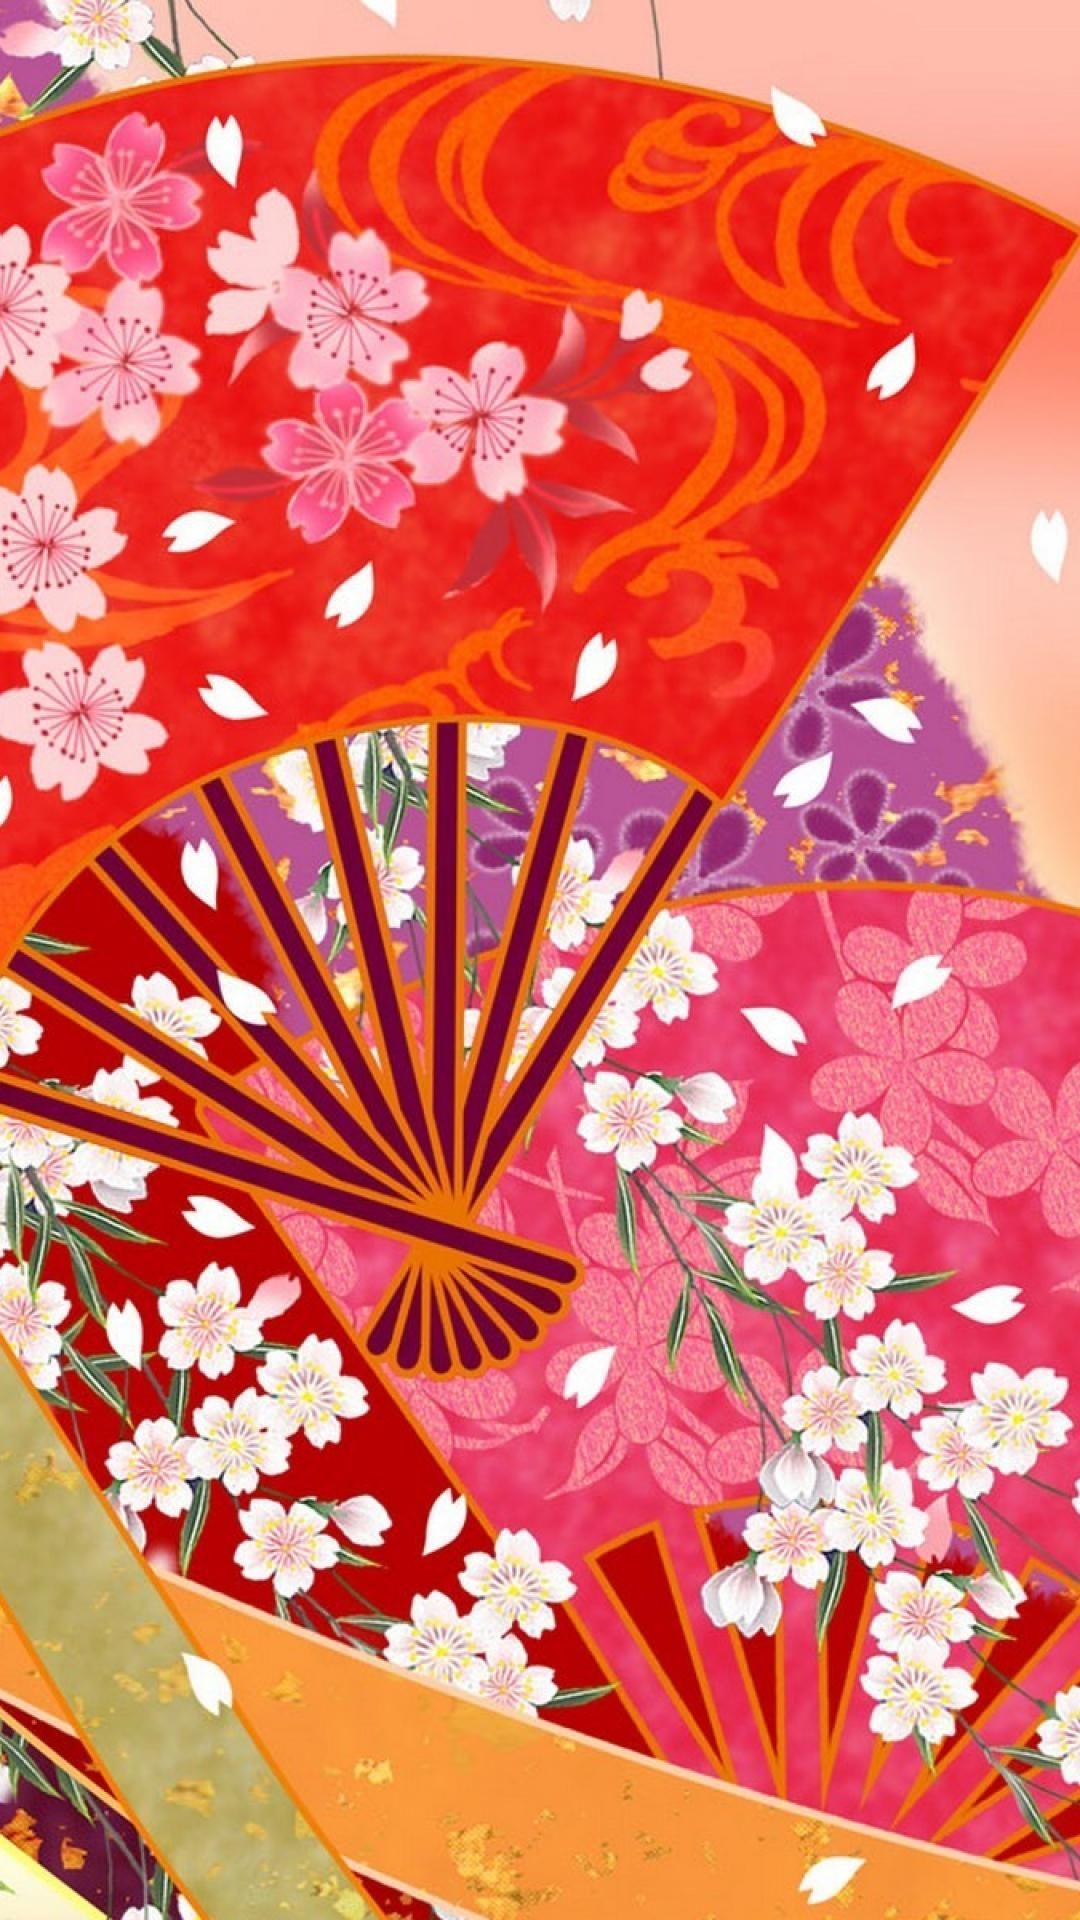 Japanese culture wallpaper Japanese wallpaper iphone